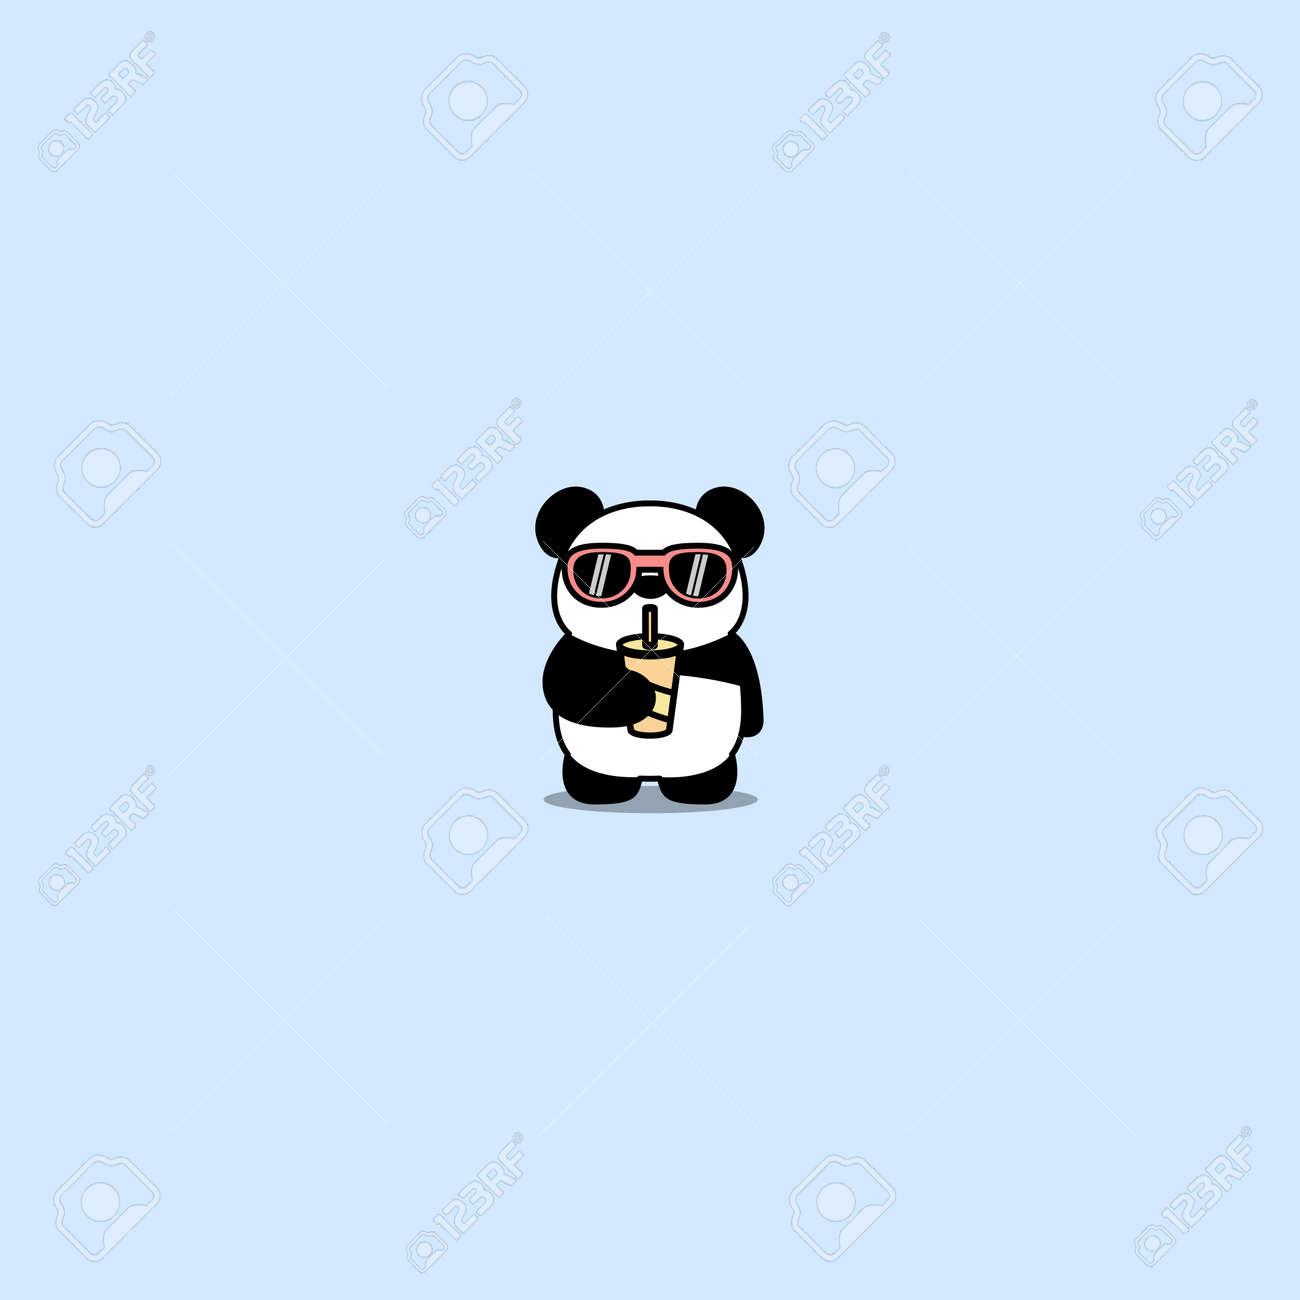 Cute panda with sunglasses drinking water cartoon, vector illustration - 164045116